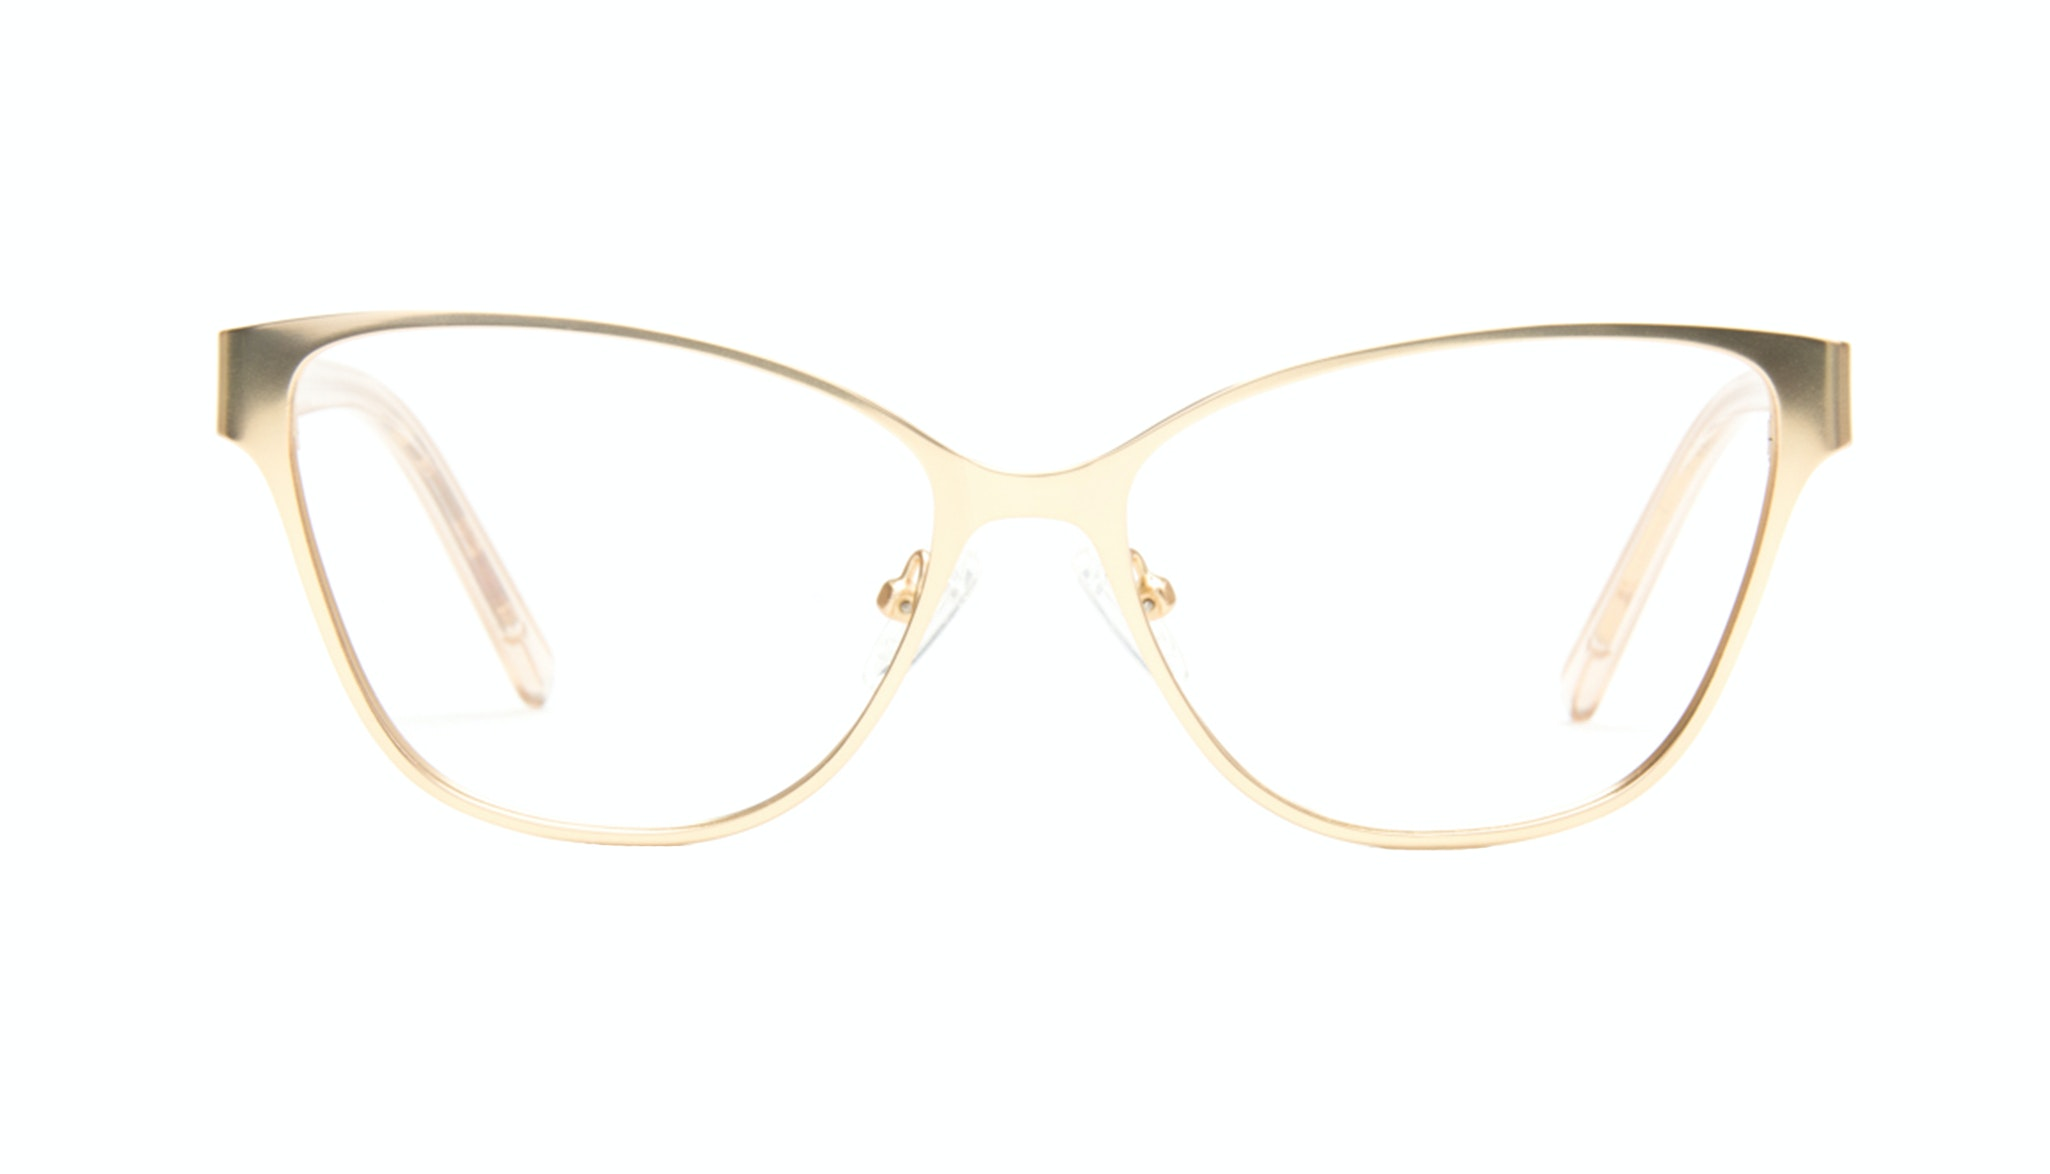 Affordable Fashion Glasses Rectangle Eyeglasses Women Radiant Gold Front